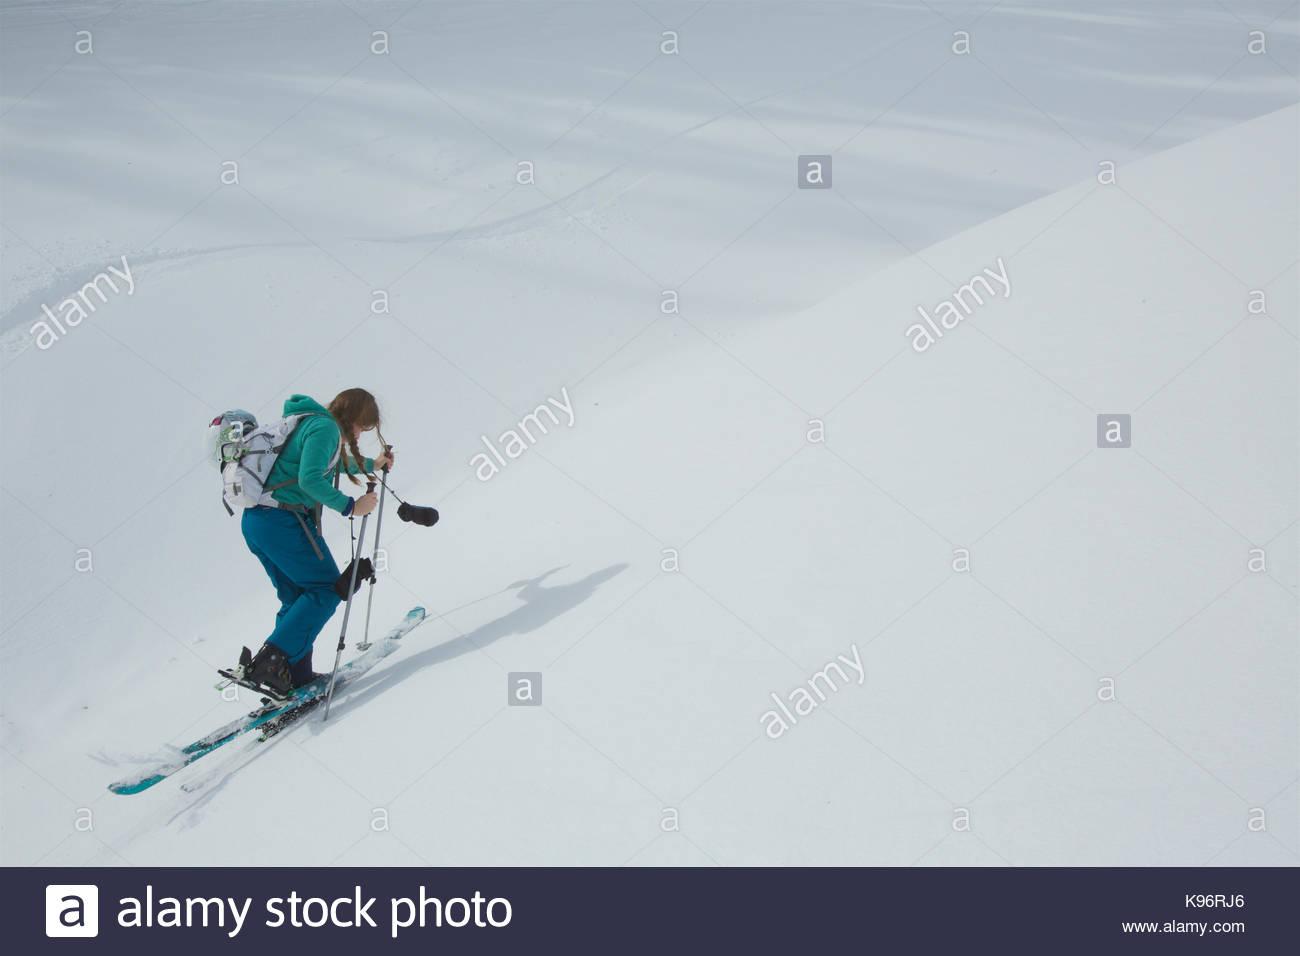 Teen girl skiing uphill with skins on her skis. - Stock Image